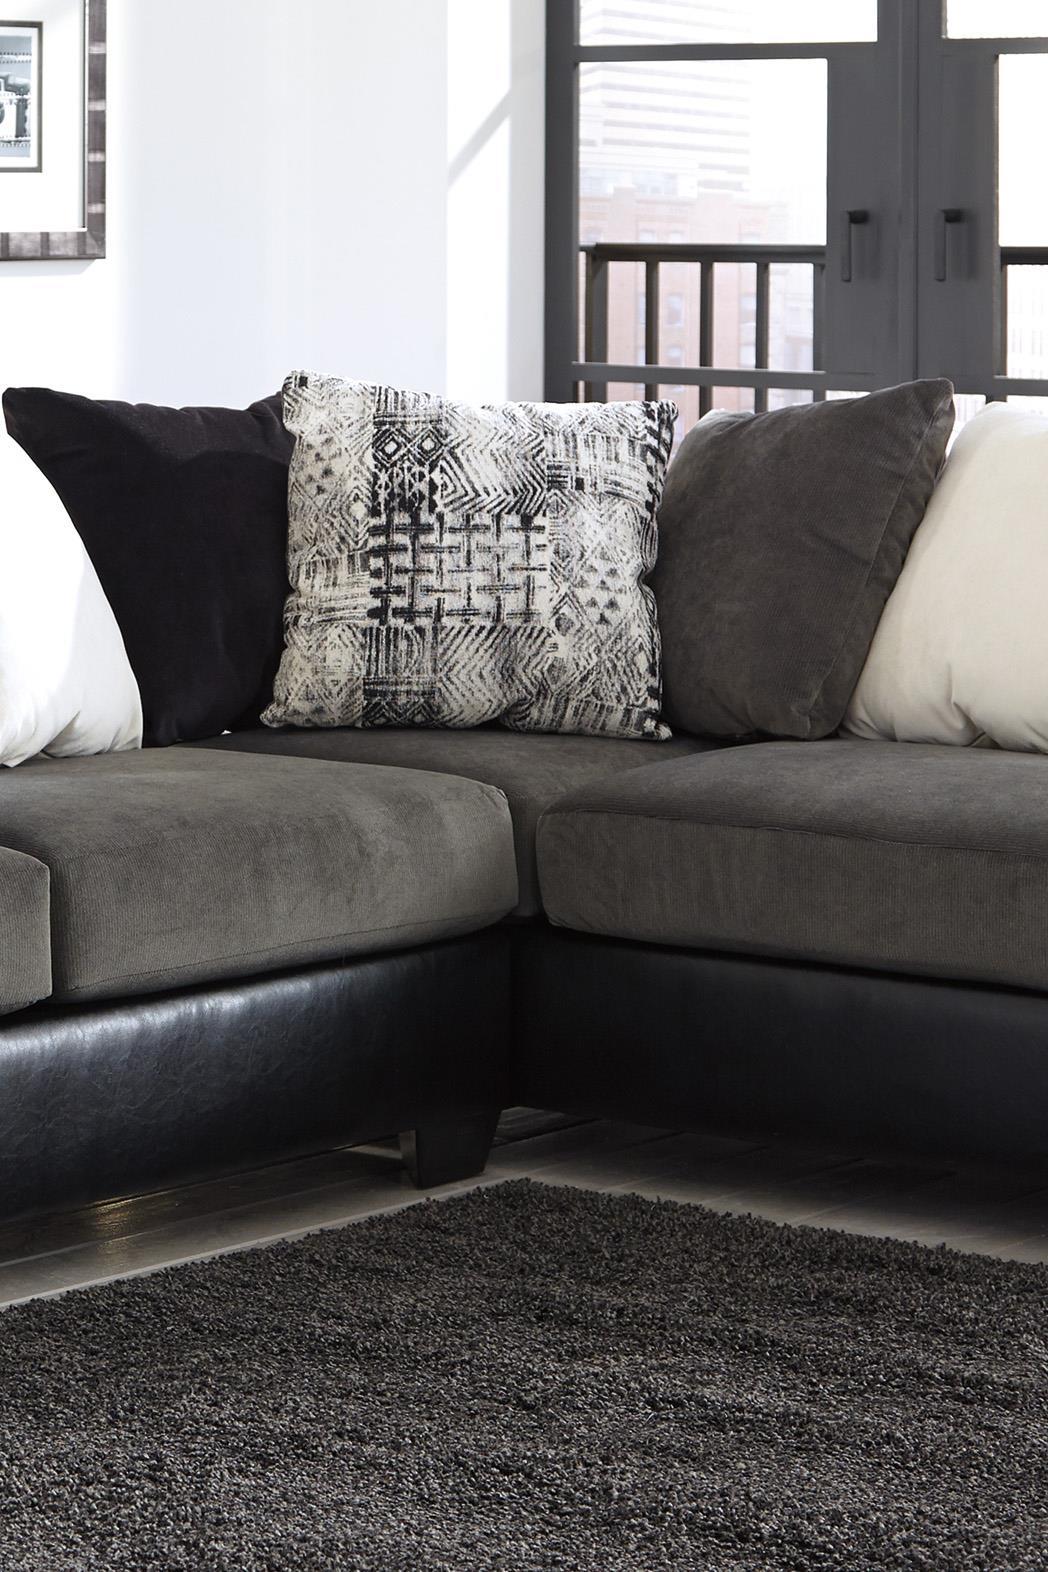 Armant 20200 By Signature Design By Ashley Hank Coca 39 S Downtown Furniture Signature Design